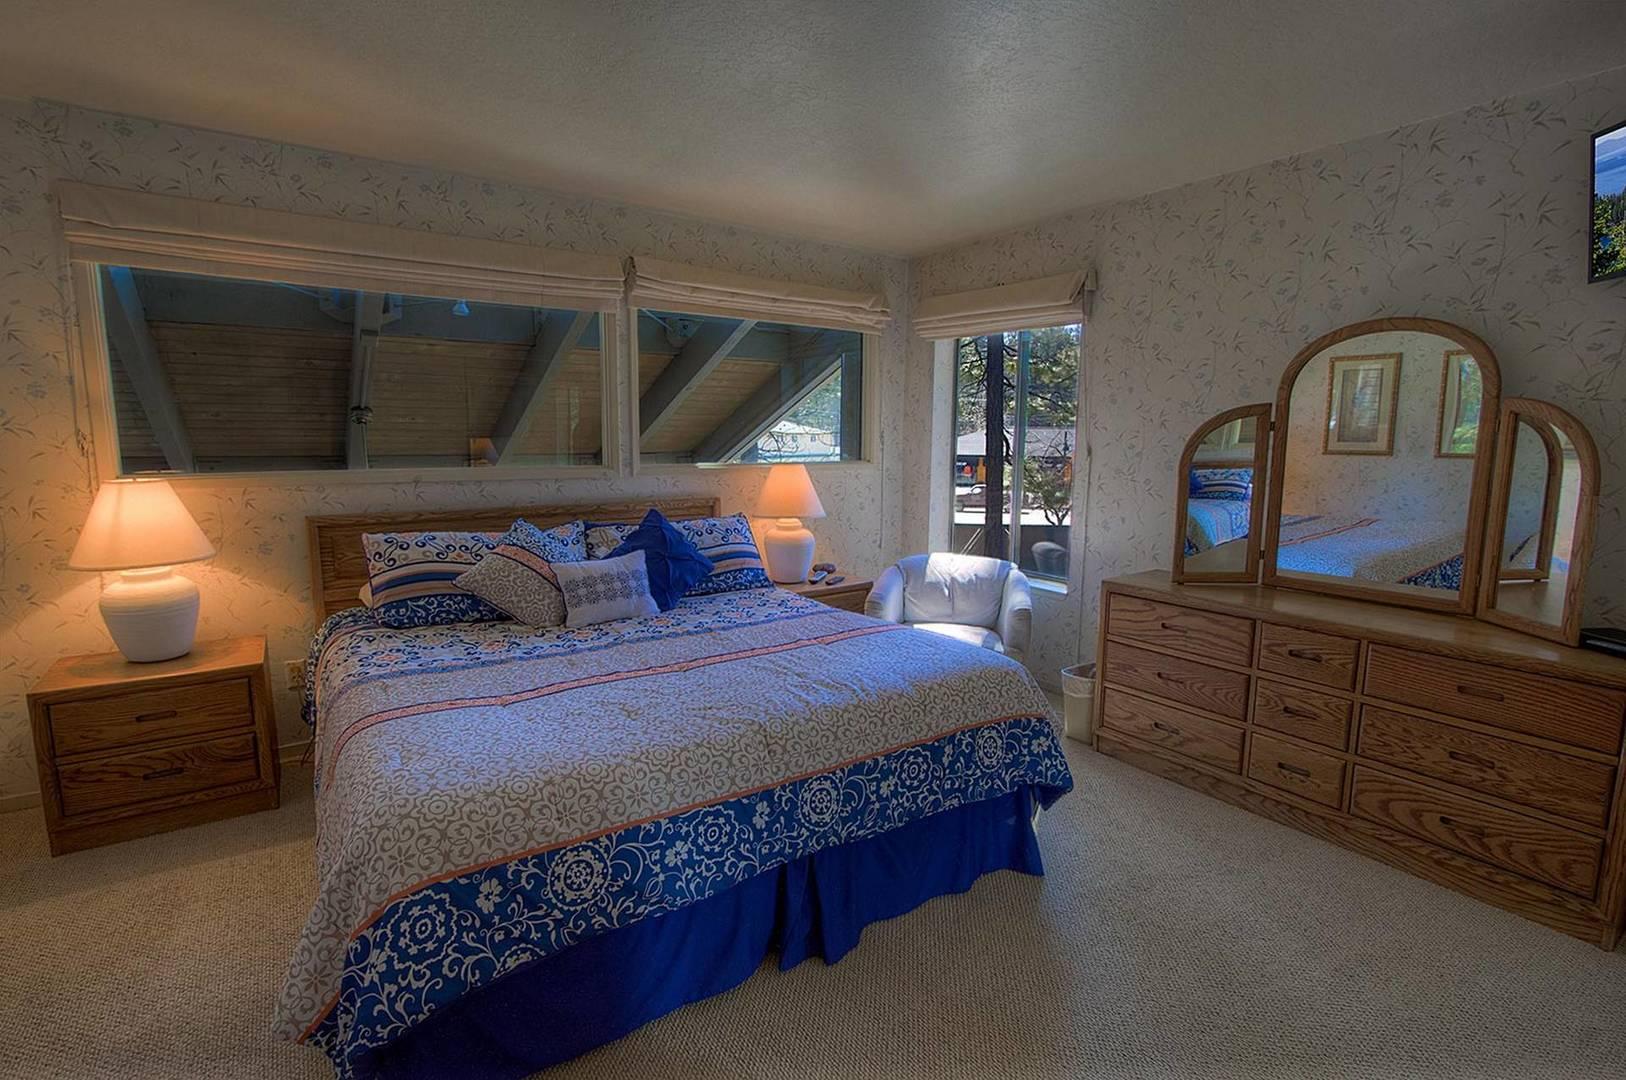 llc0804 bedroom